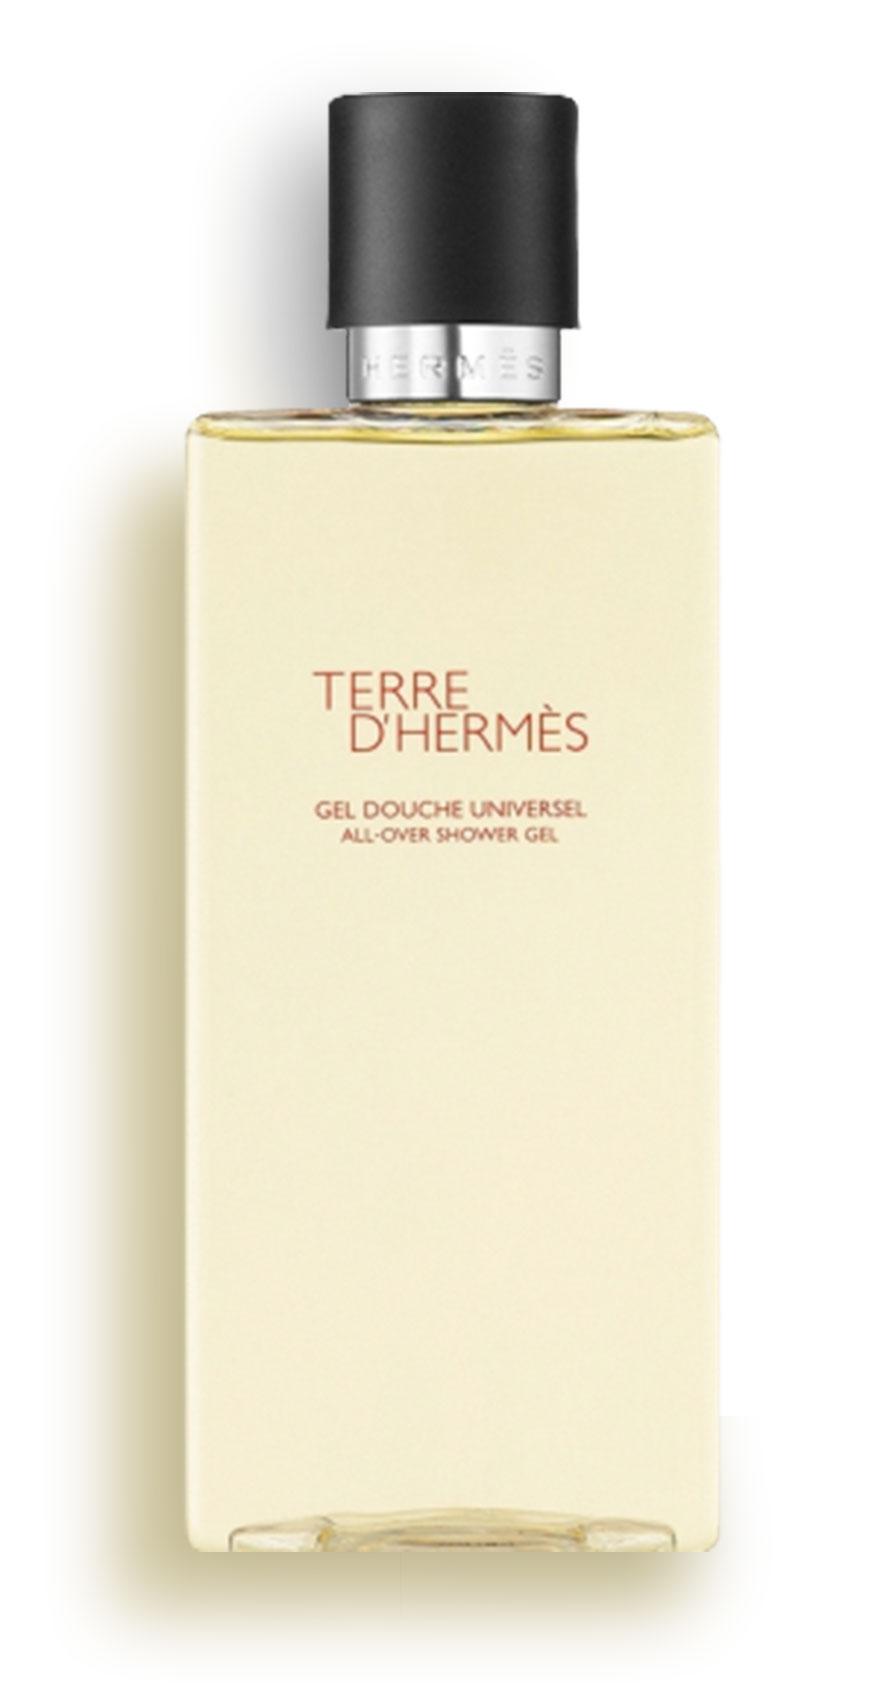 Hermès - Terre d'Hermès - Gel douche.